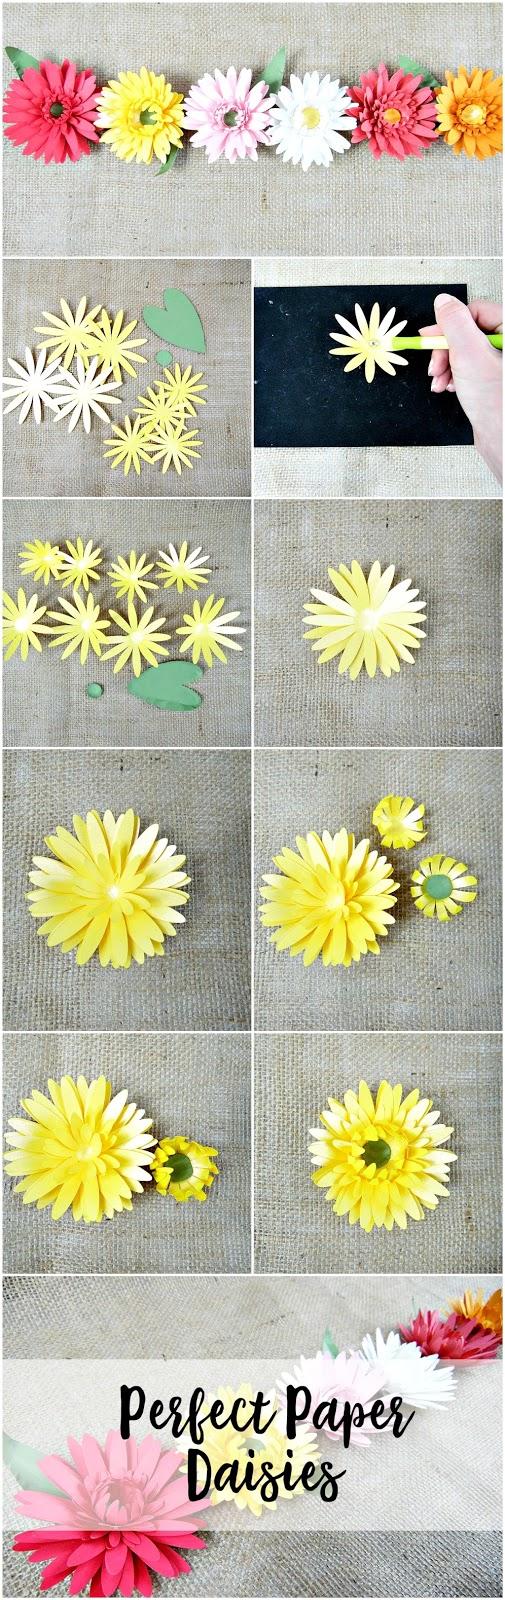 Perfect paper daisies. DIY paper flowers